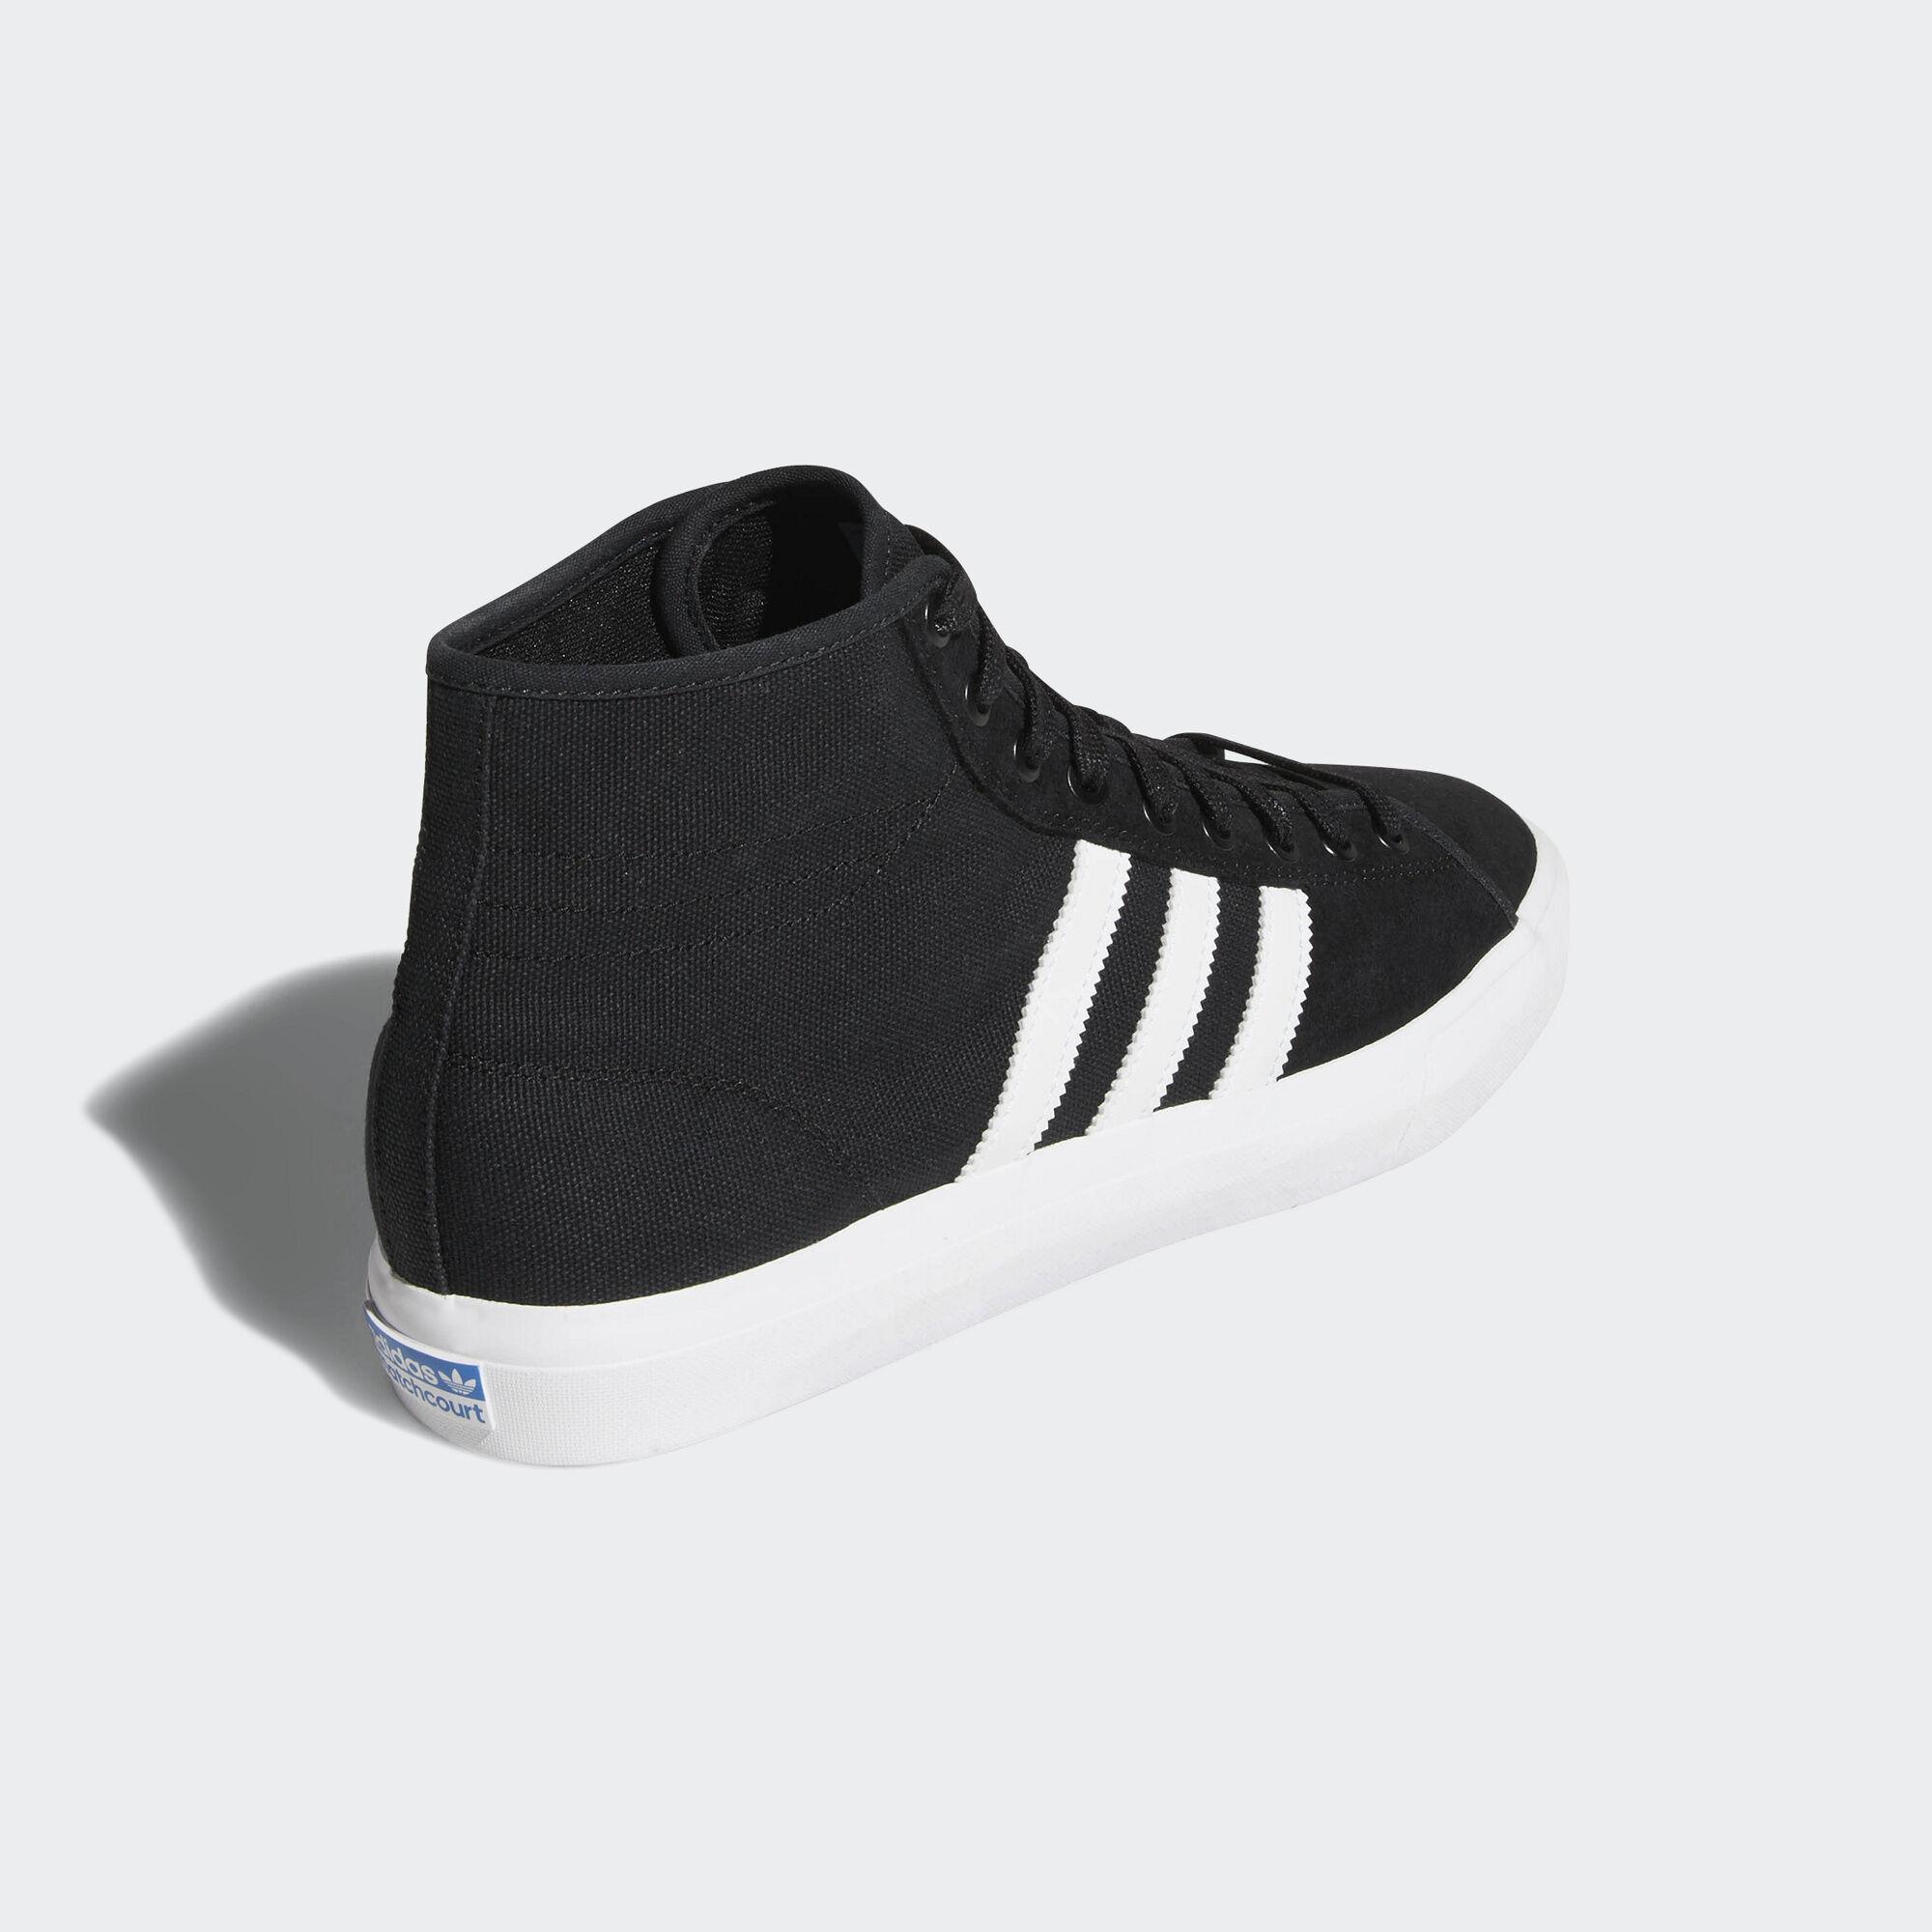 Zapatillas de caña alta Matchcourt High RX adidas de Lona de color Negro para hombre